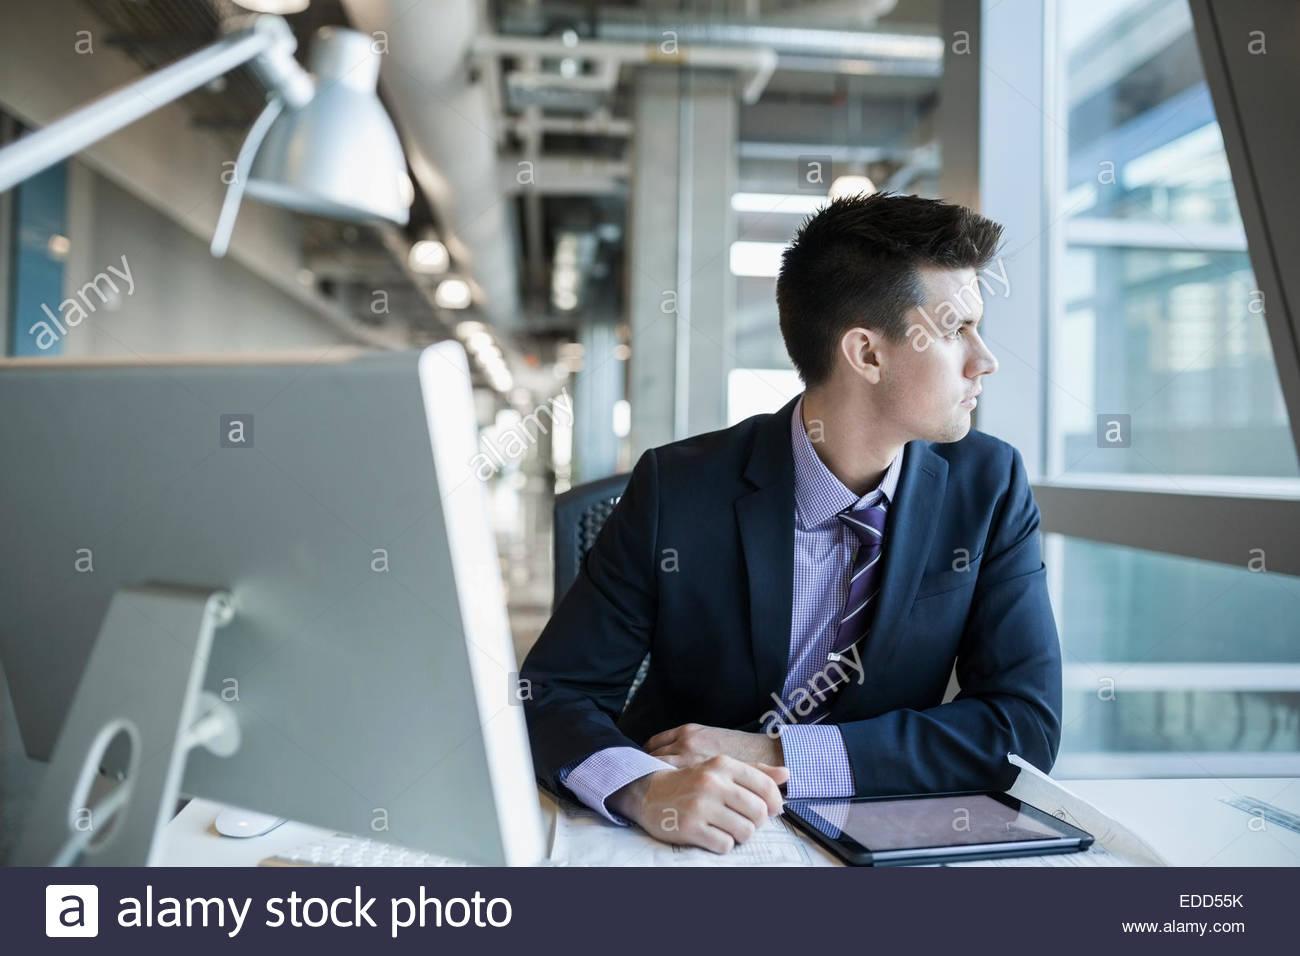 Pensive woman Photo Stock